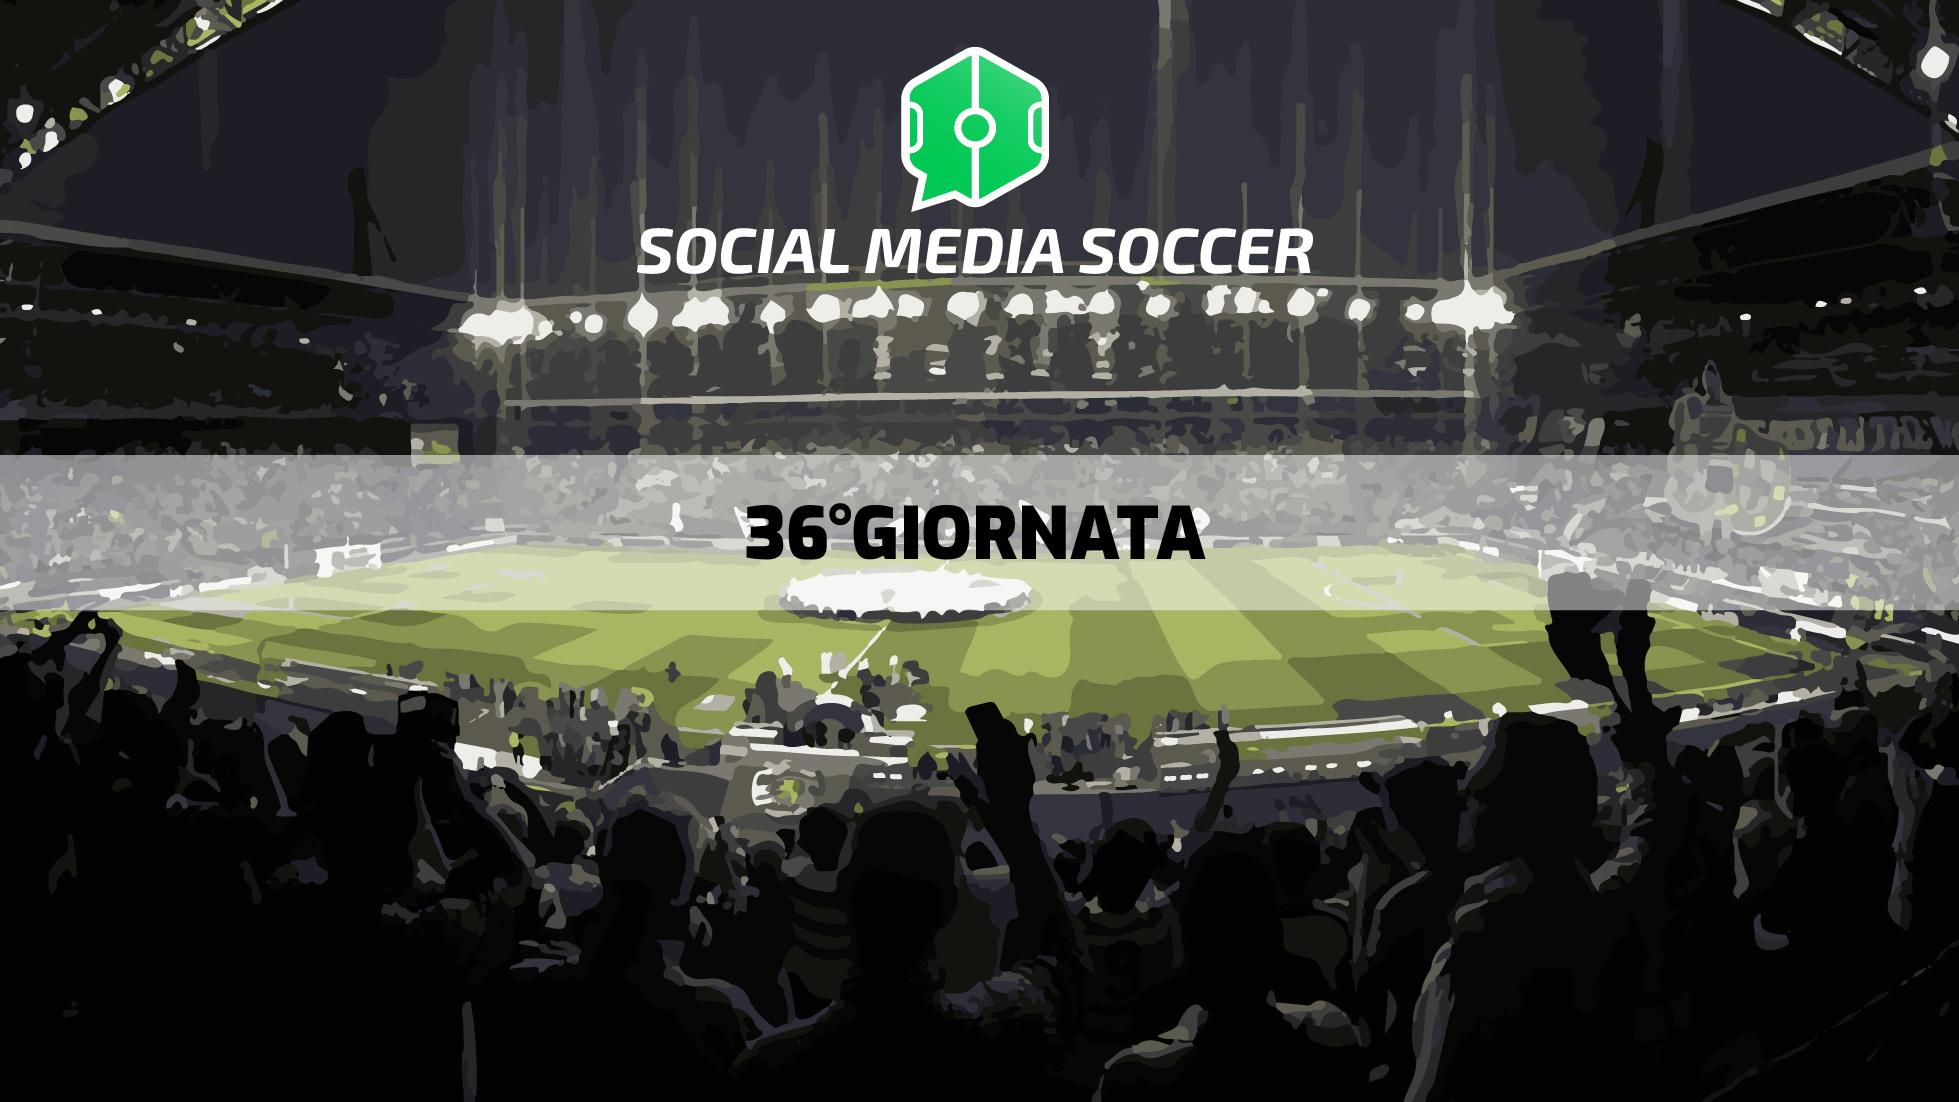 36esima giornata Serie A social